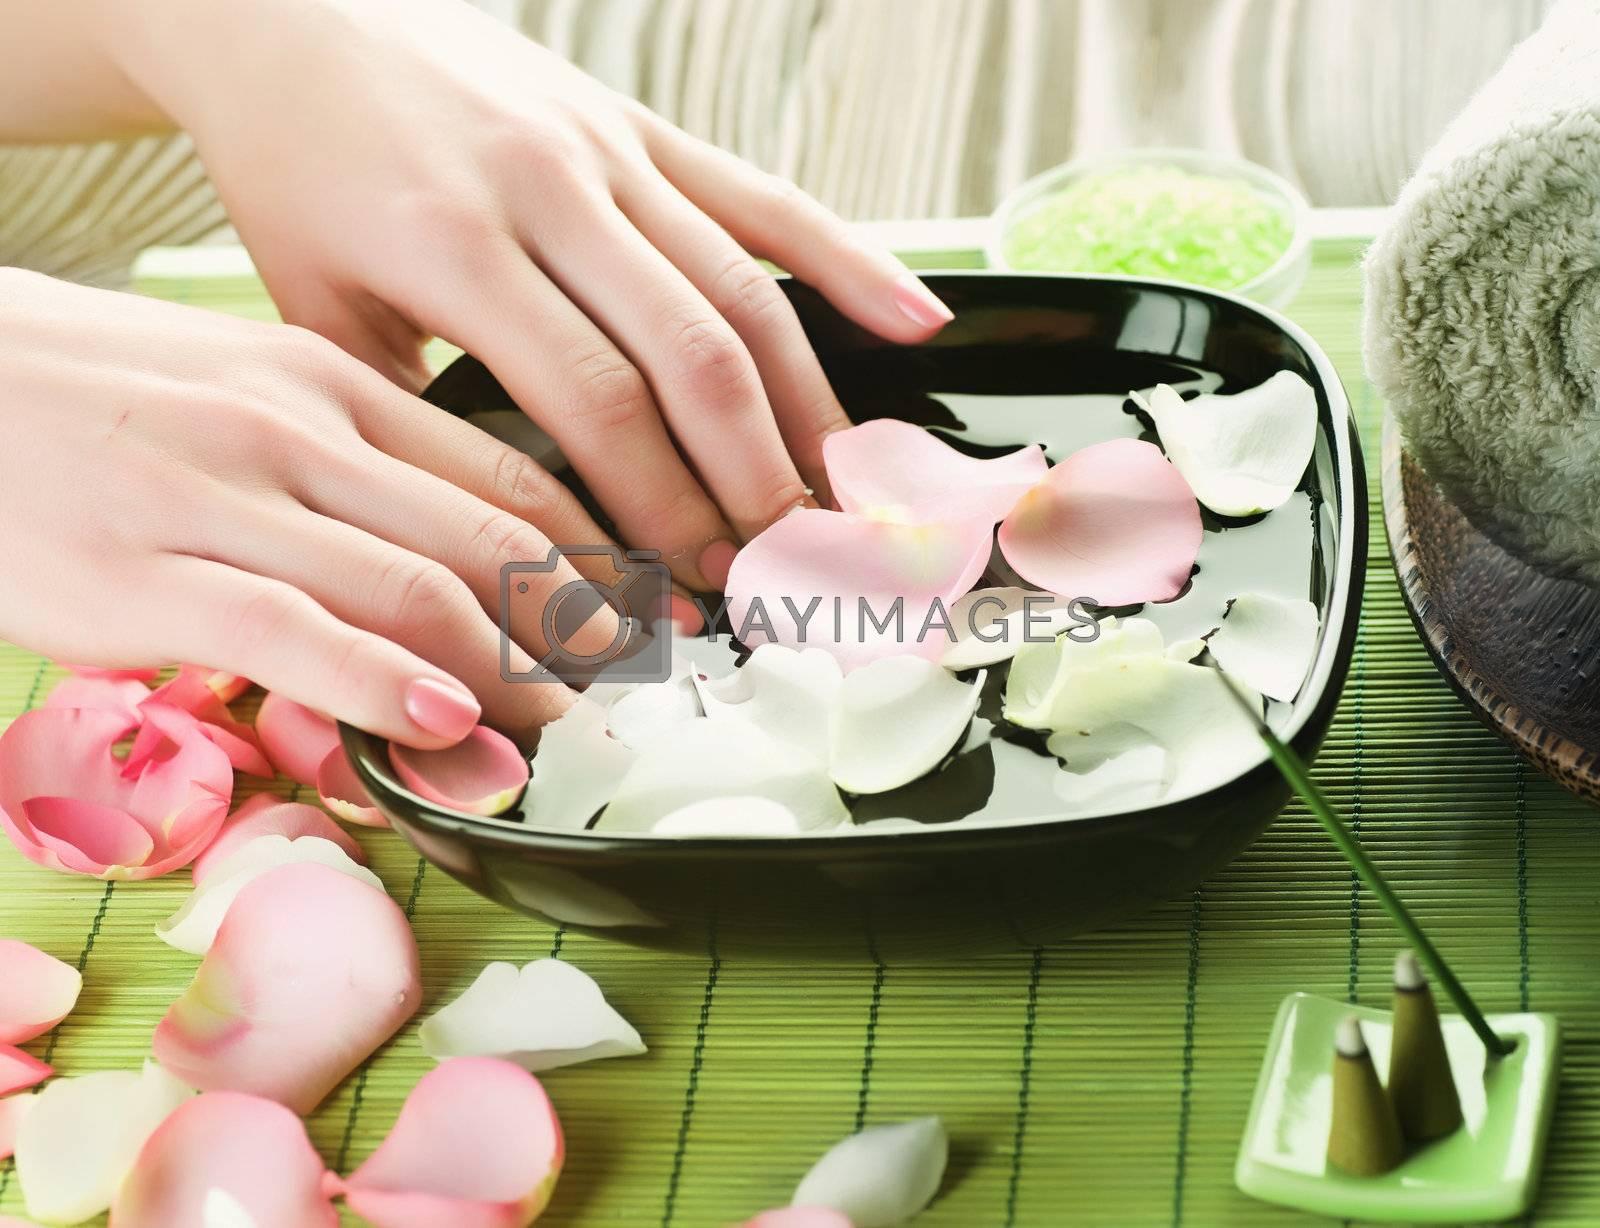 Luxury Manicure Concept  by Subbotina Anna